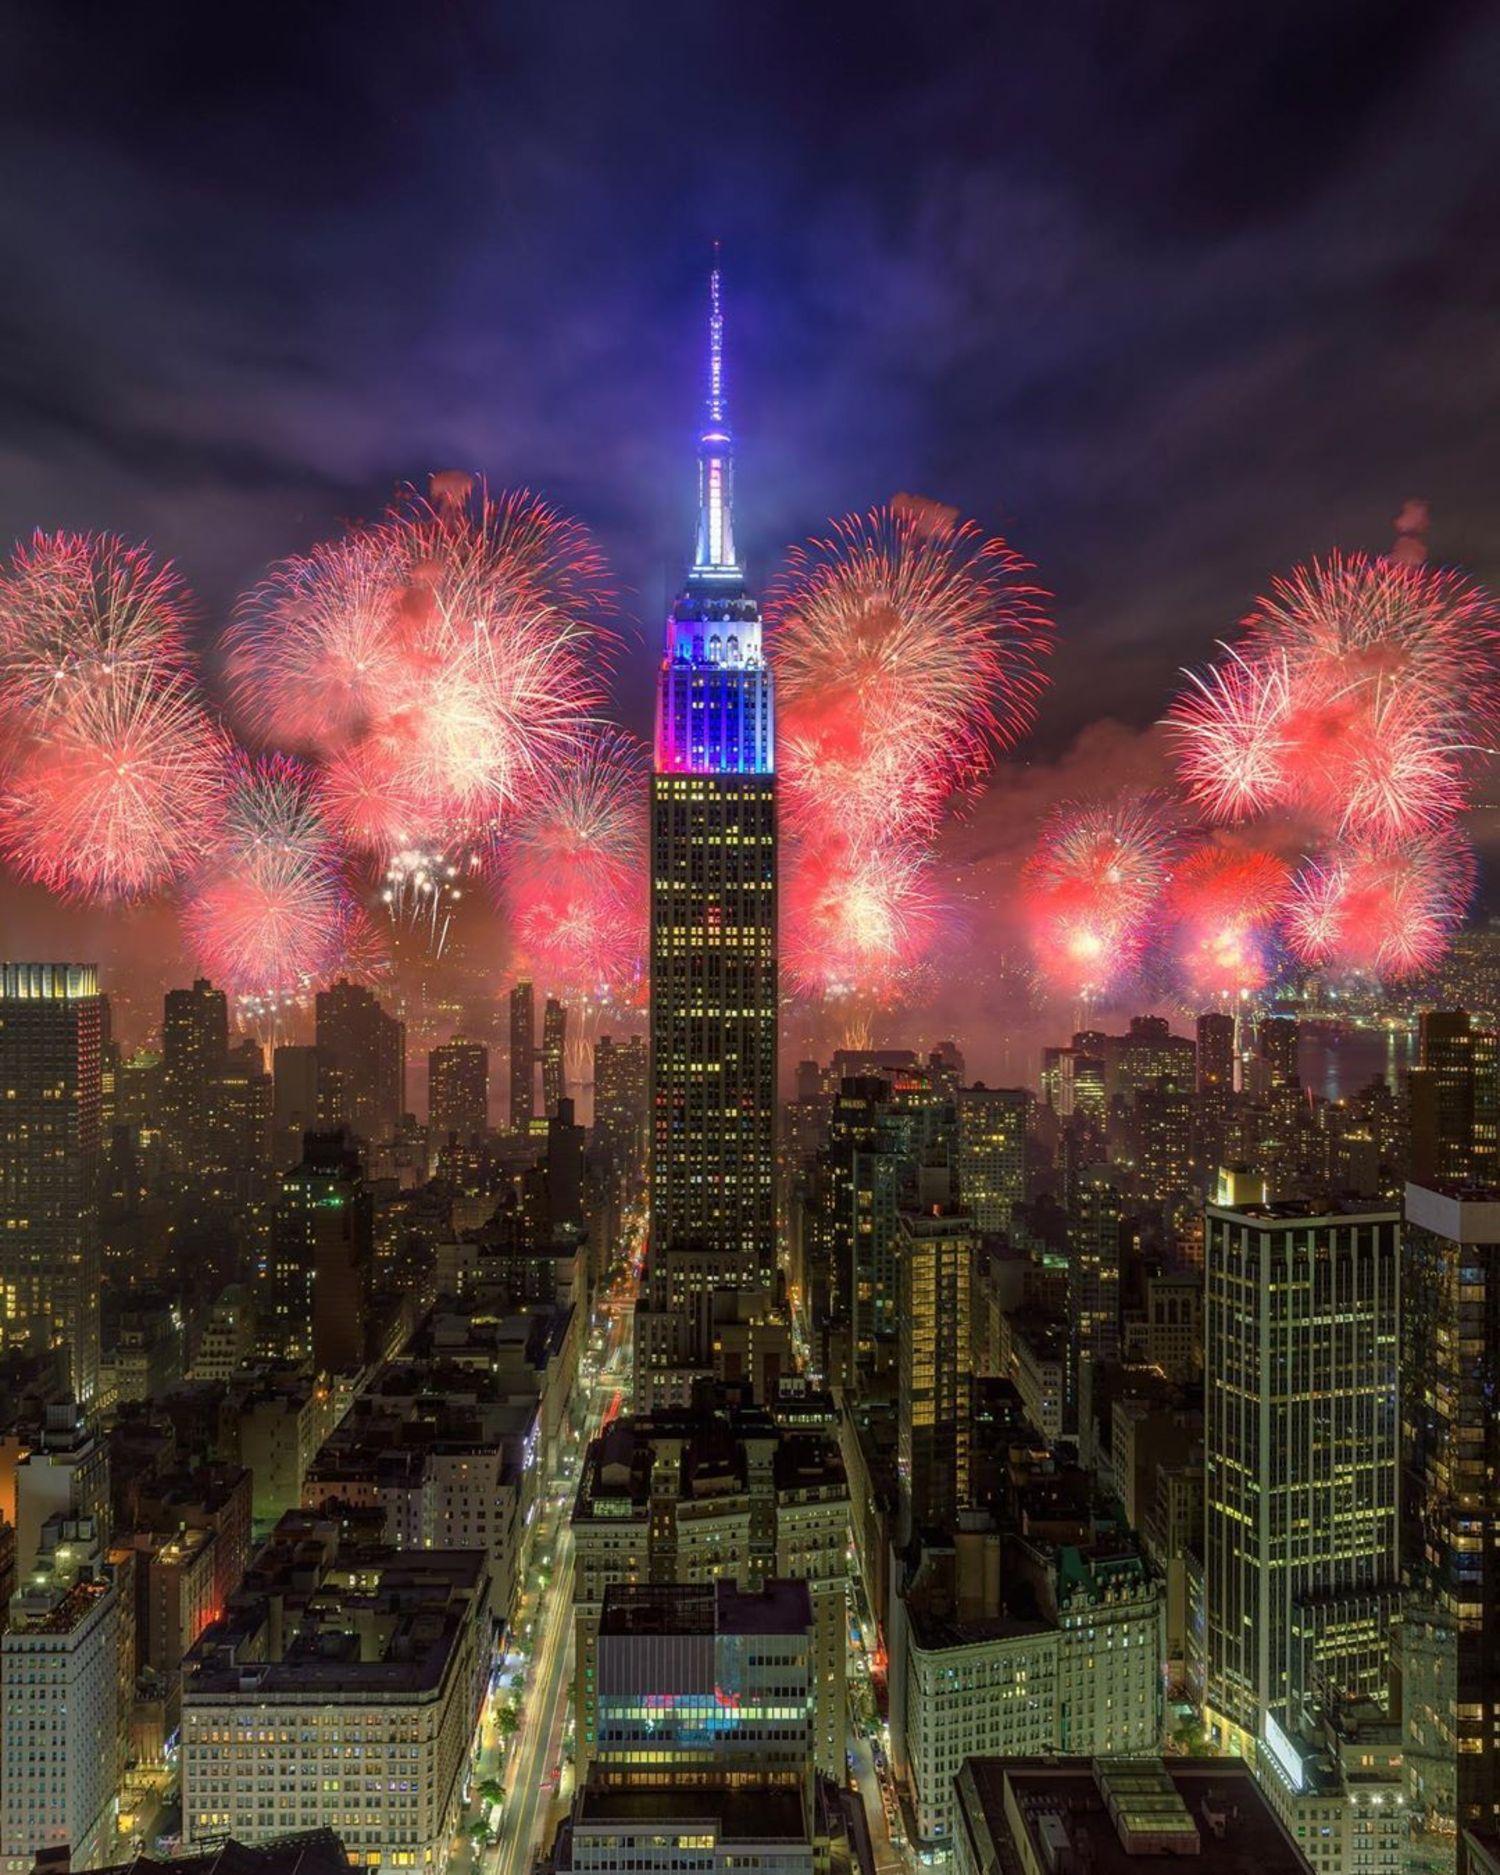 Fireworks over Empire State Building, Midtown, Manhattan